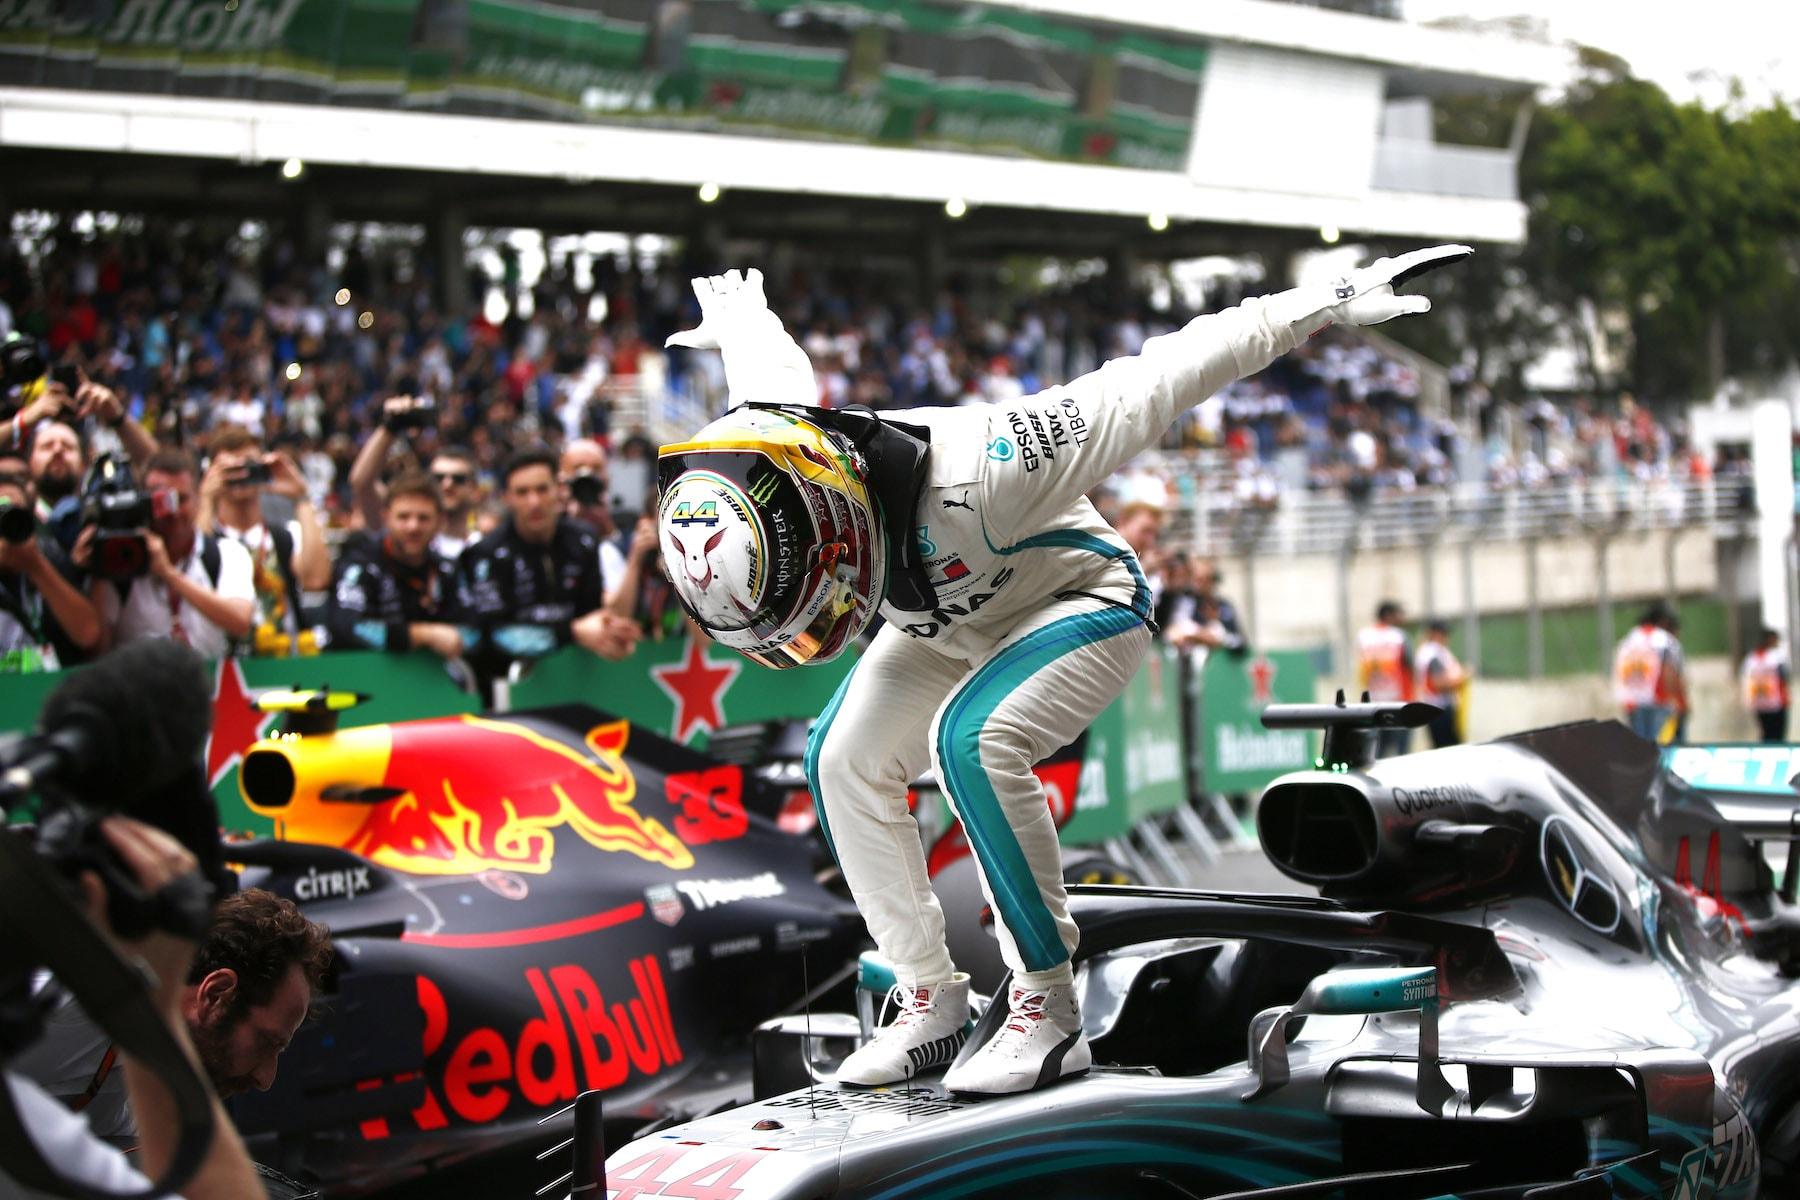 R 2018 Lewis Hamilton | Mercedes W09 | 2018 Brazilian GP winner 2 copy.jpg